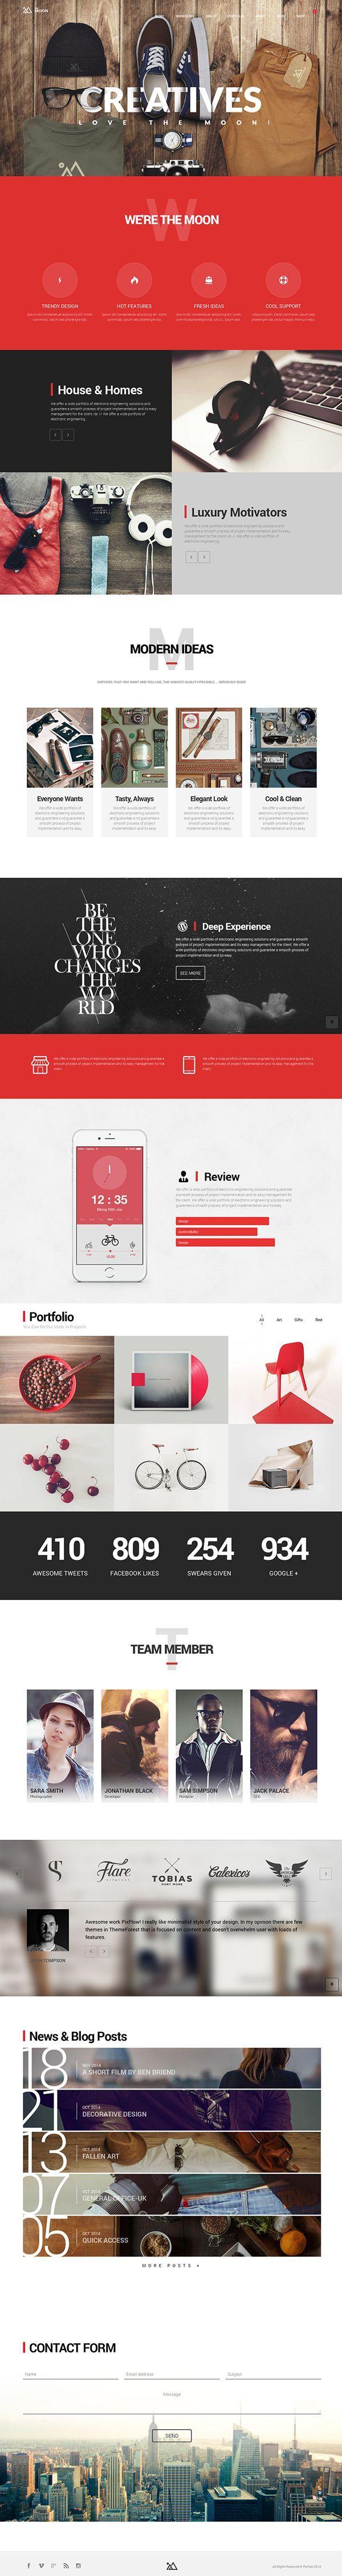 Cool Website Designs for Inspiration | web设 计 | Pinterest | Pagina ...